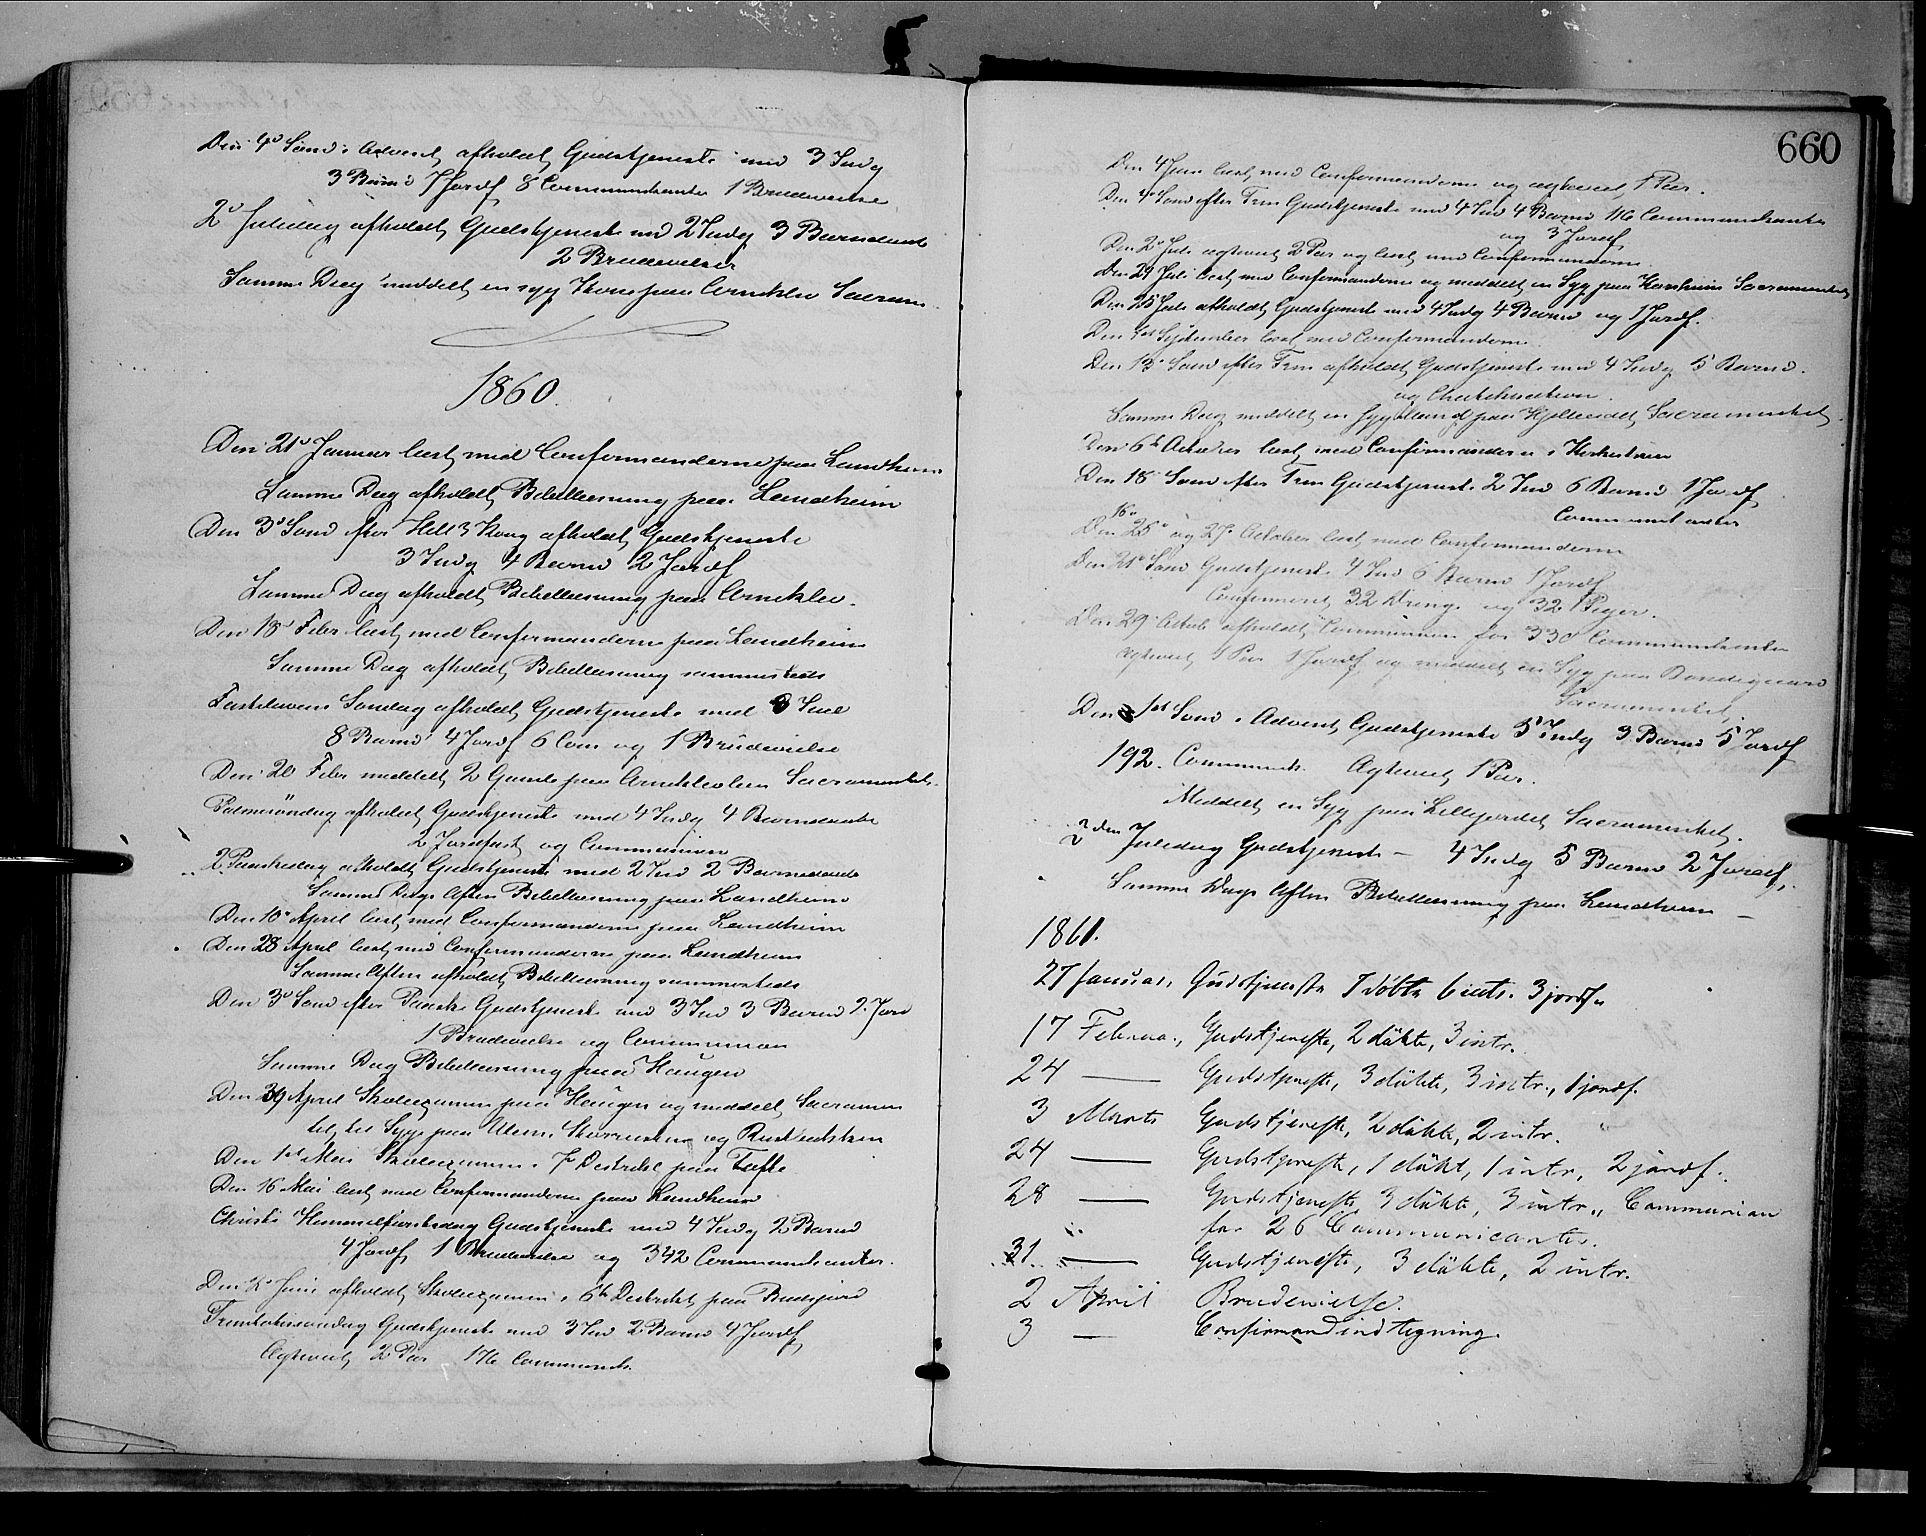 SAH, Dovre prestekontor, Parish register (official) no. 1, 1854-1878, p. 660